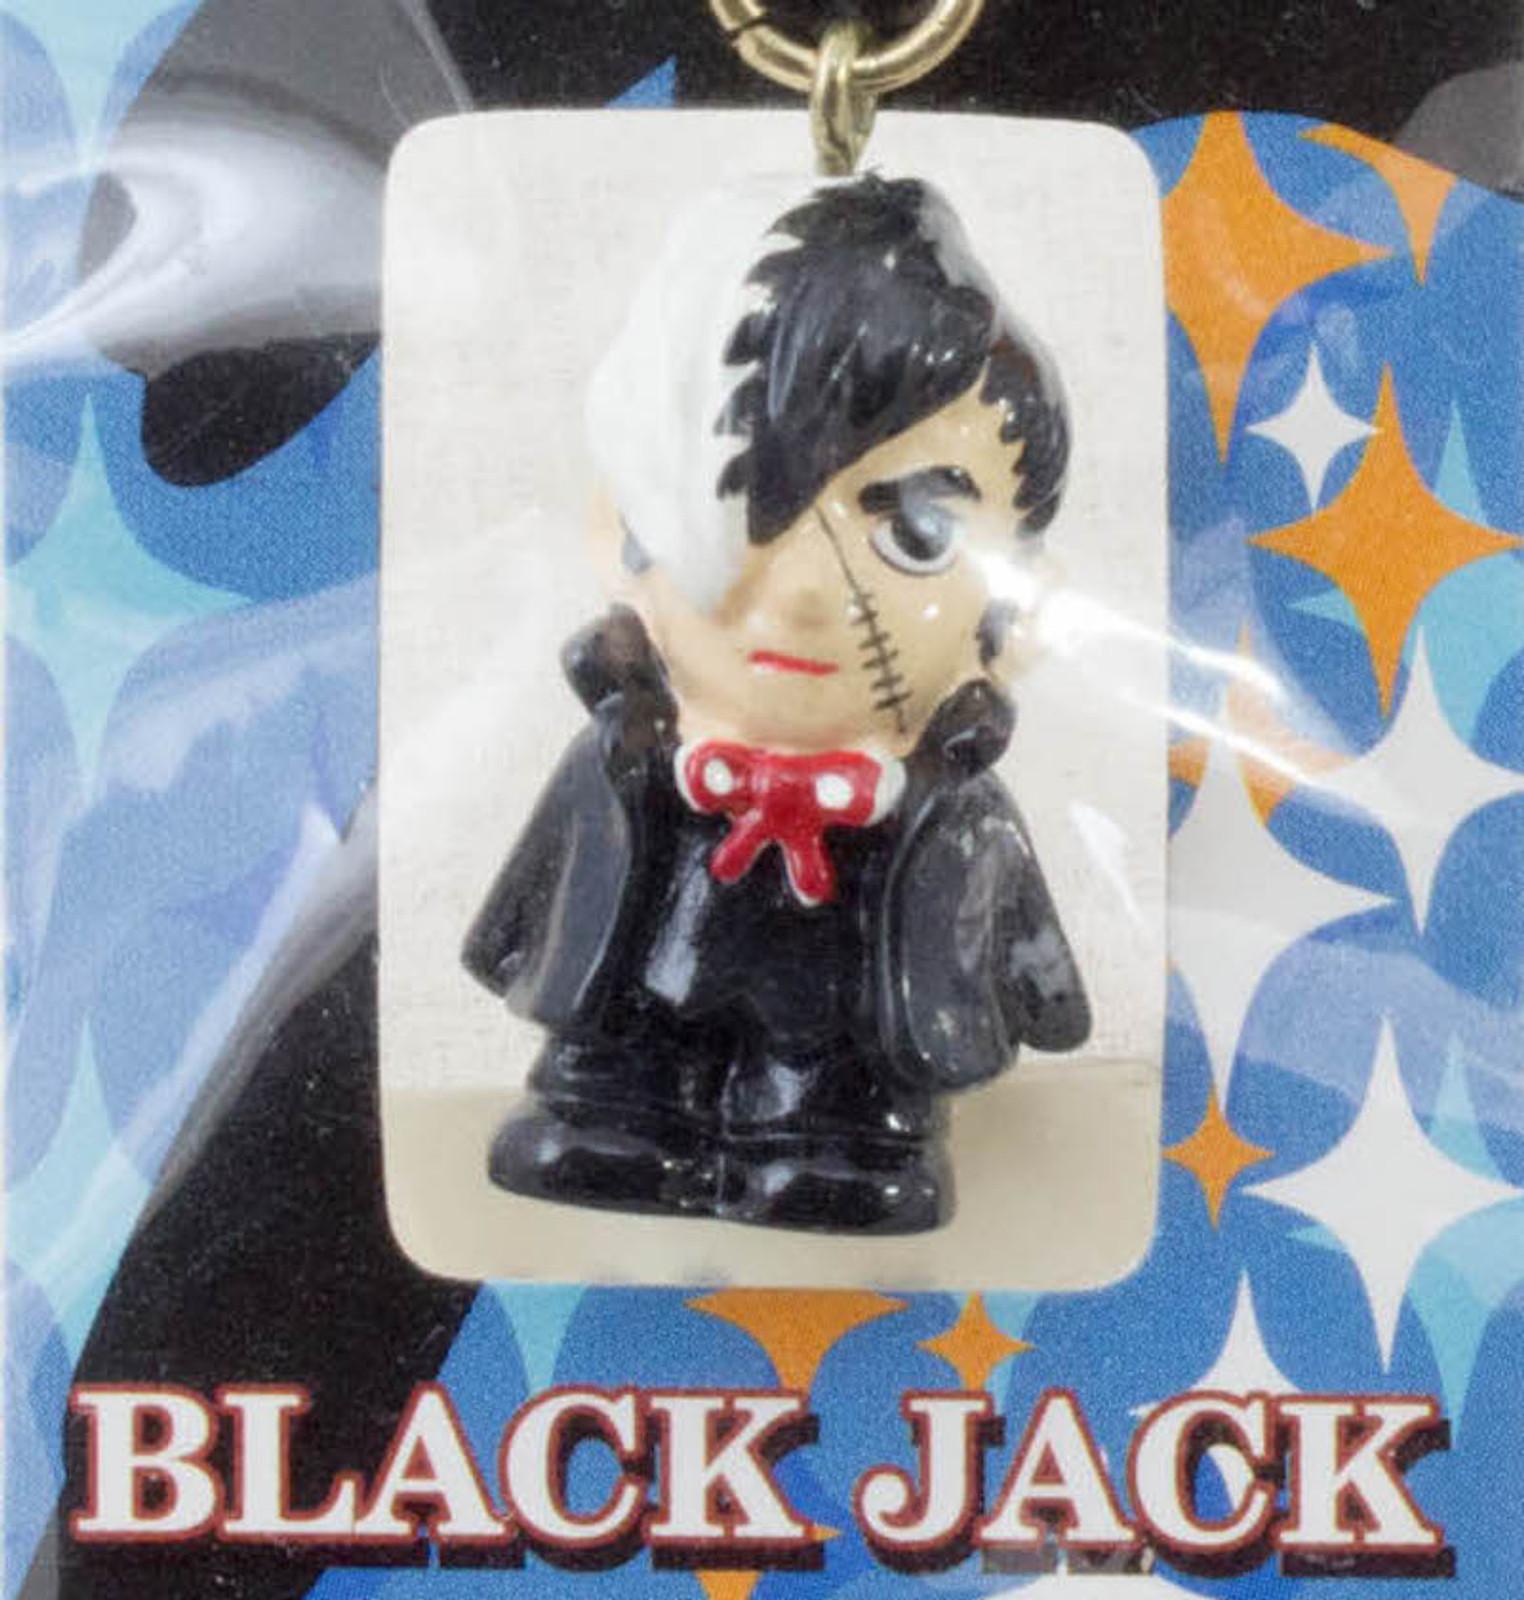 Black Jack Mascot Figure Strap Tezuka Osamu JAPAN ANIME